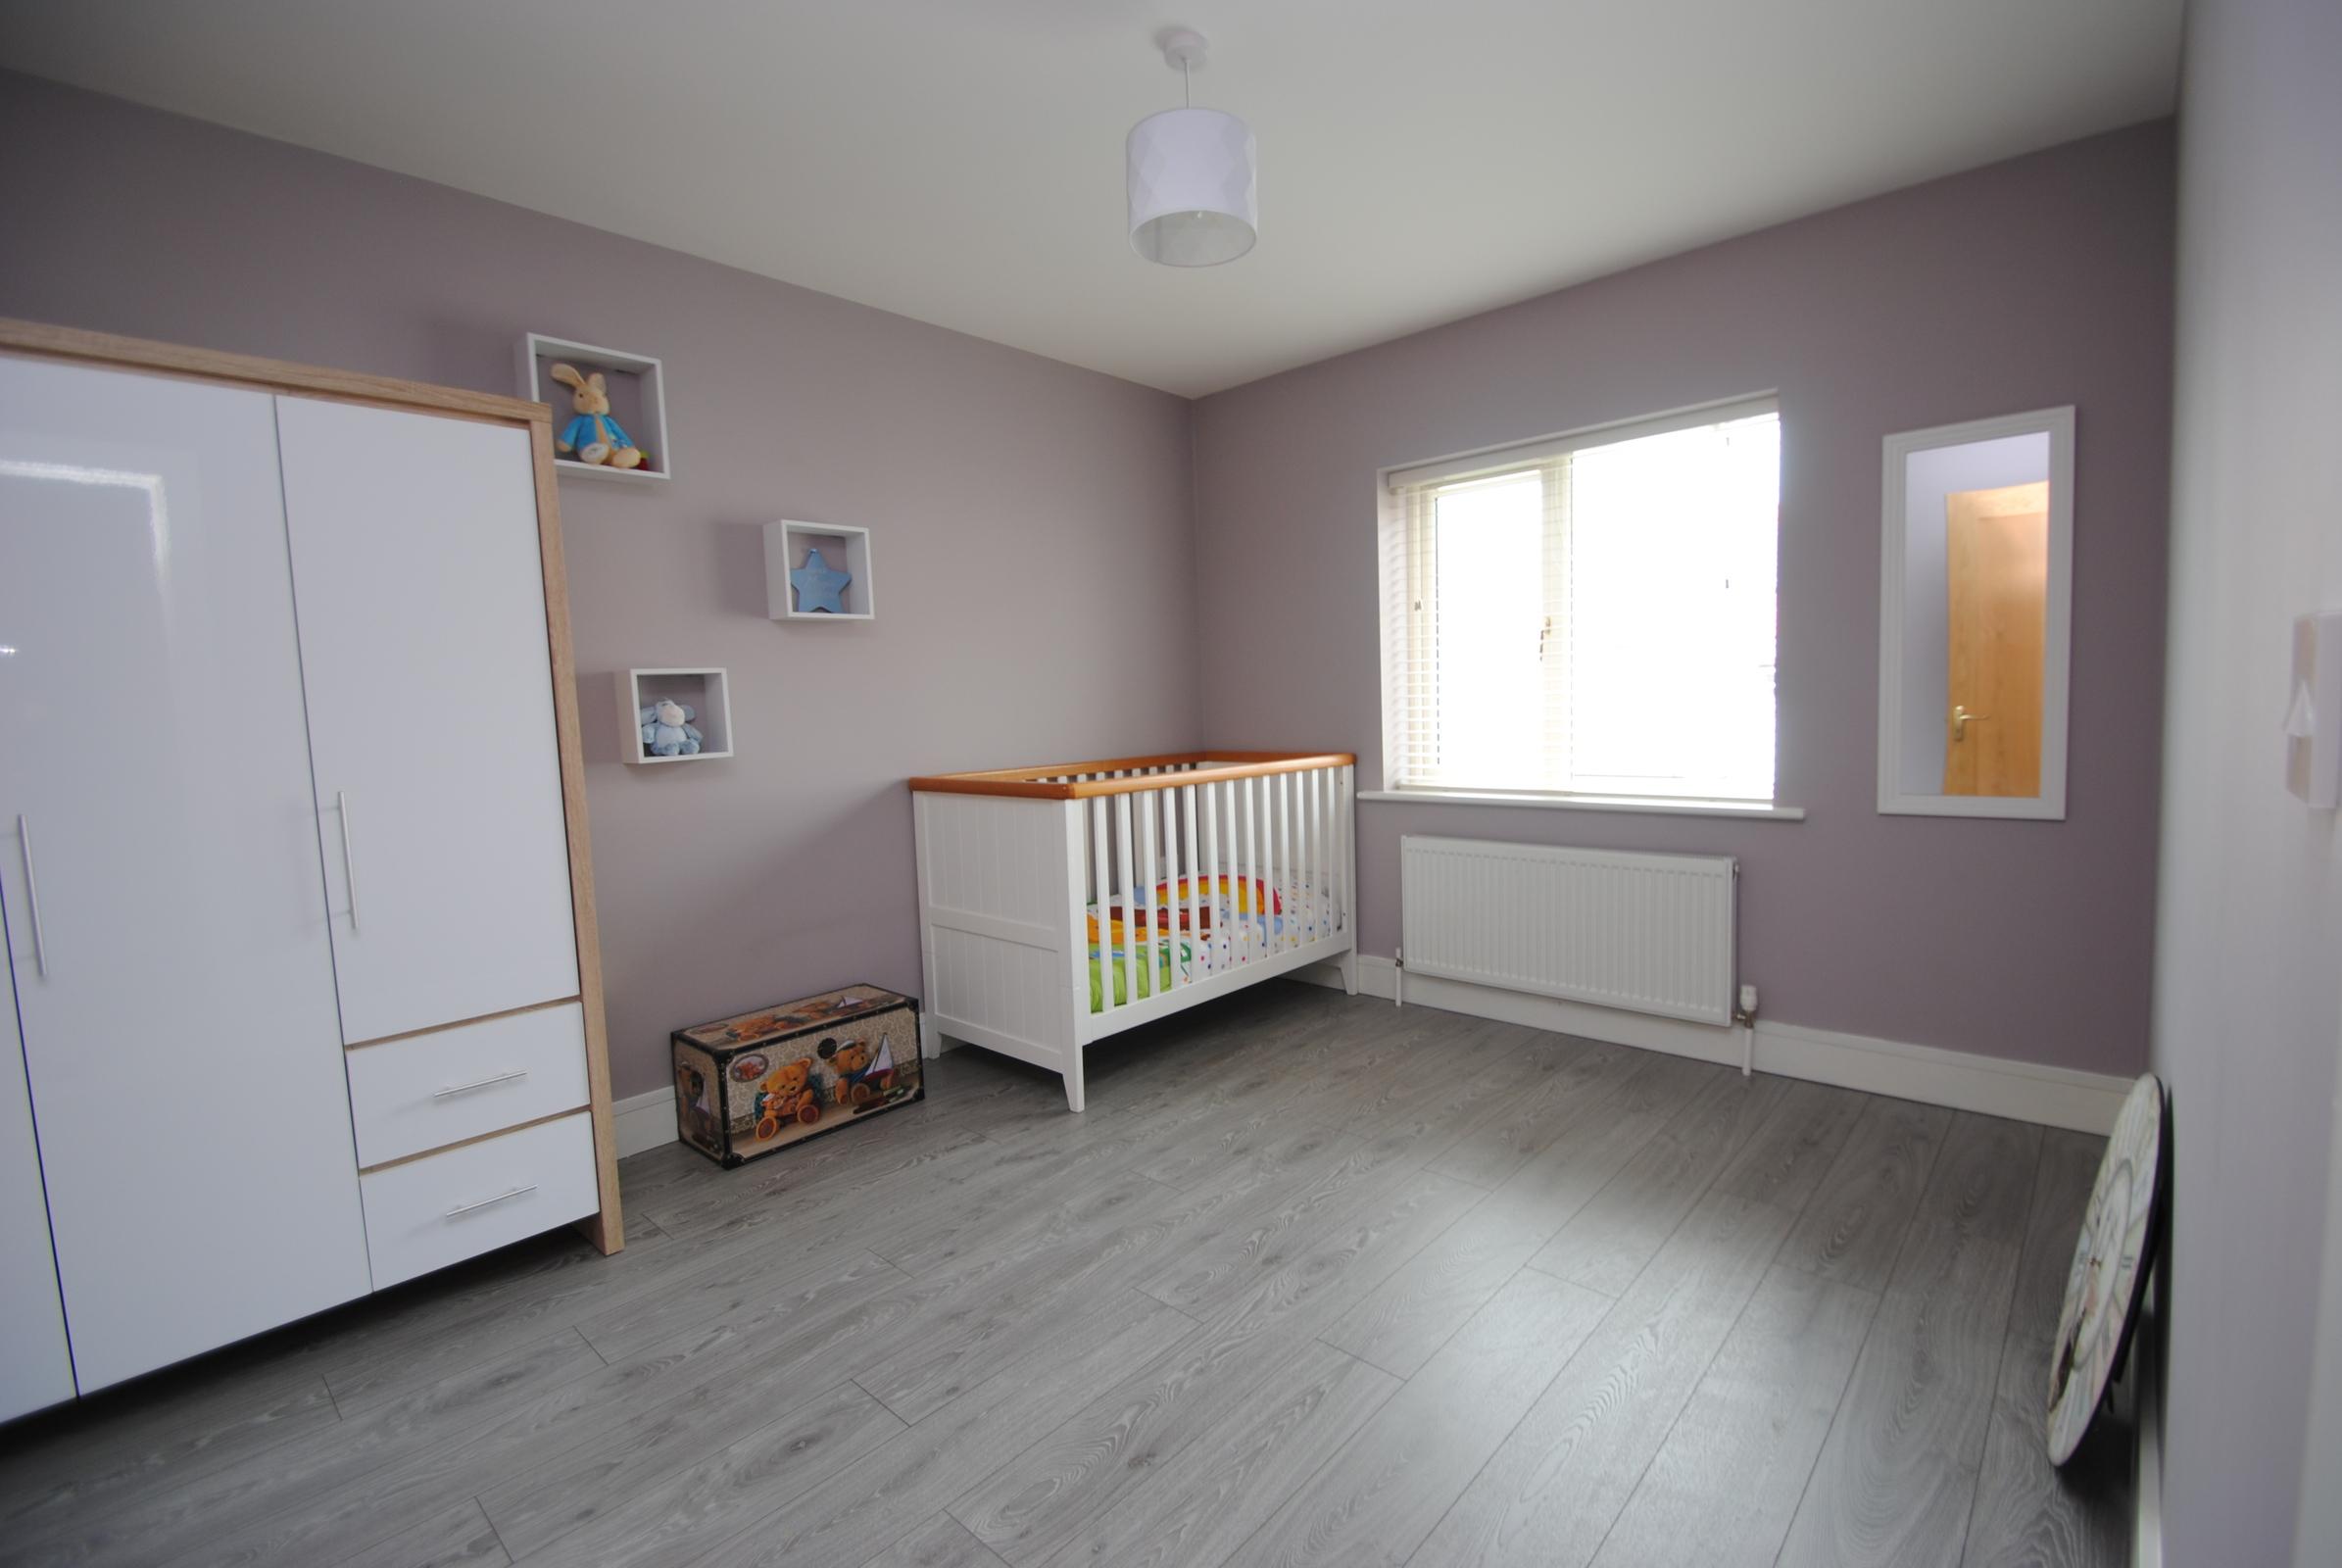 16 Lavender Court, Forest Hill, Carrigaline, Co. Cork